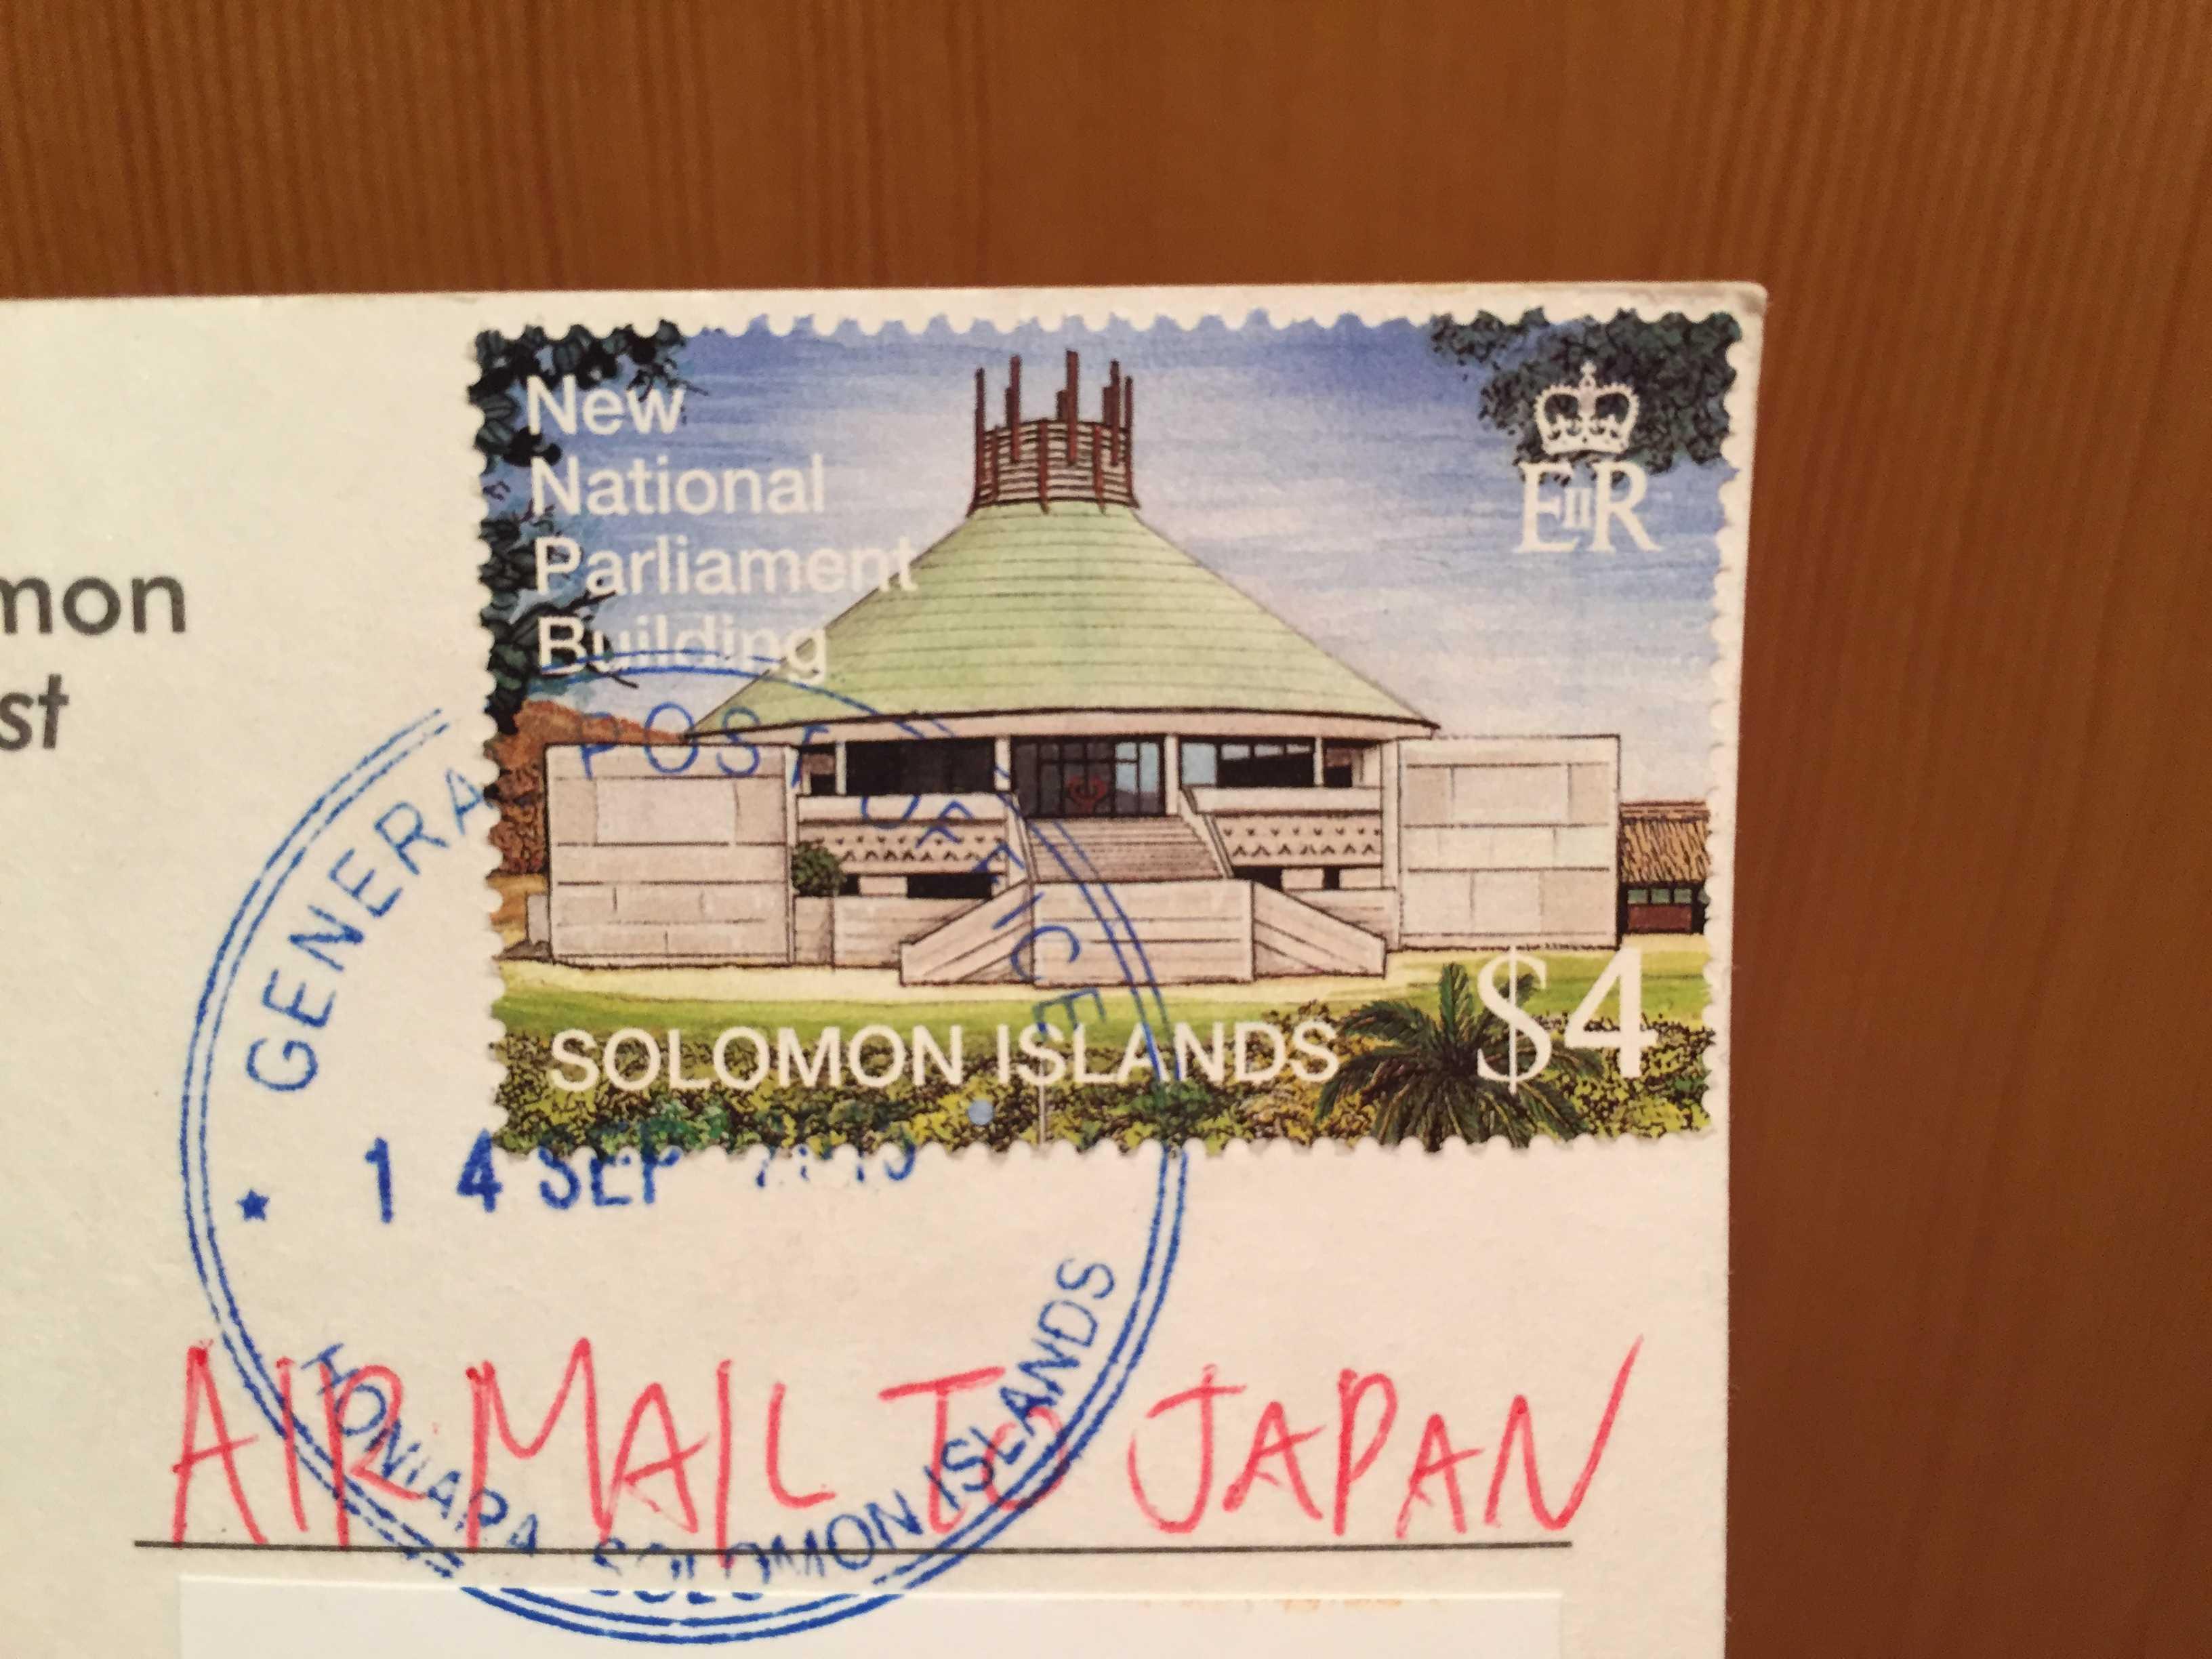 HONIARA SOLOMON ISLANDS(ホニアラ ソロモン諸島) の消印